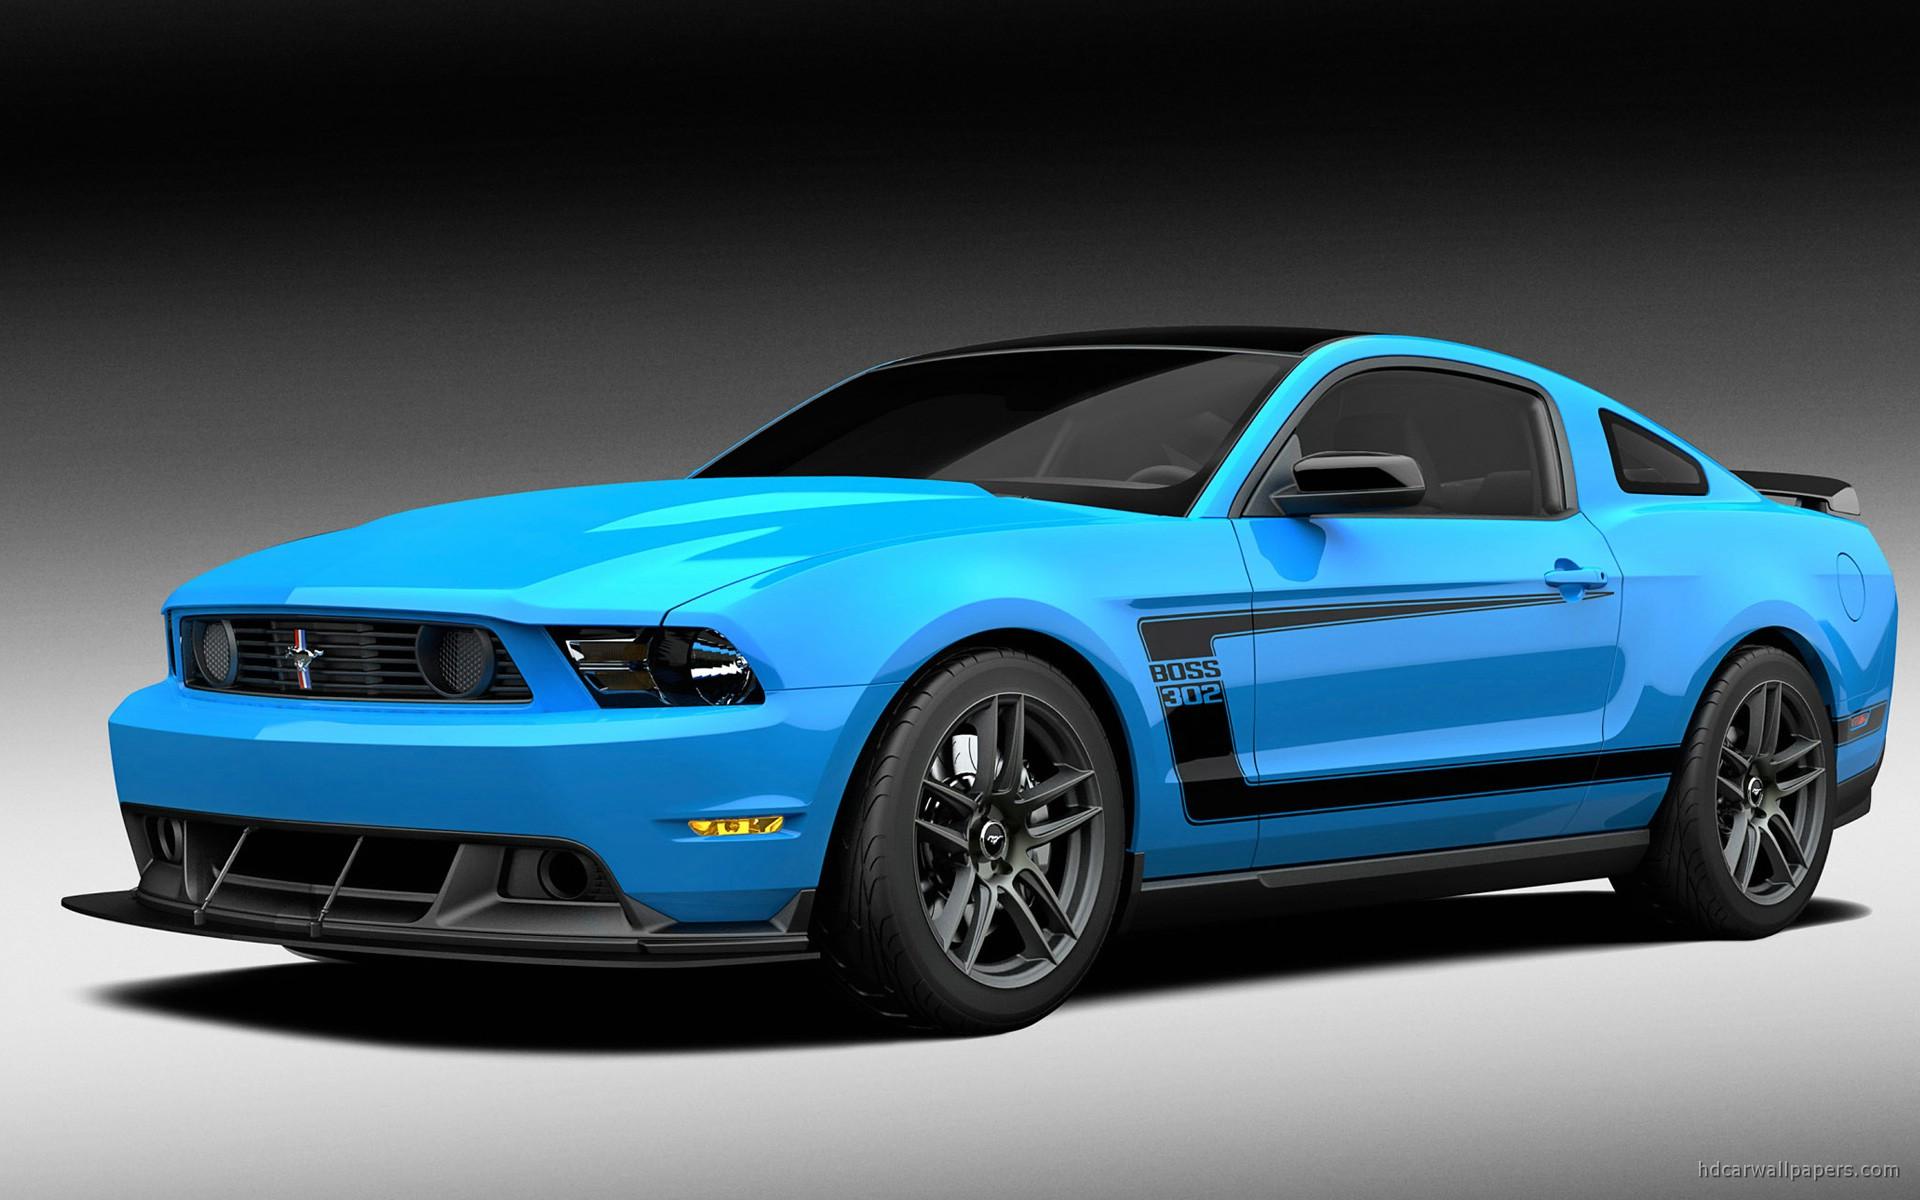 Blue 2012 Ford Mustang Boss Wallpaper HD Car Wallpapers 1920x1200